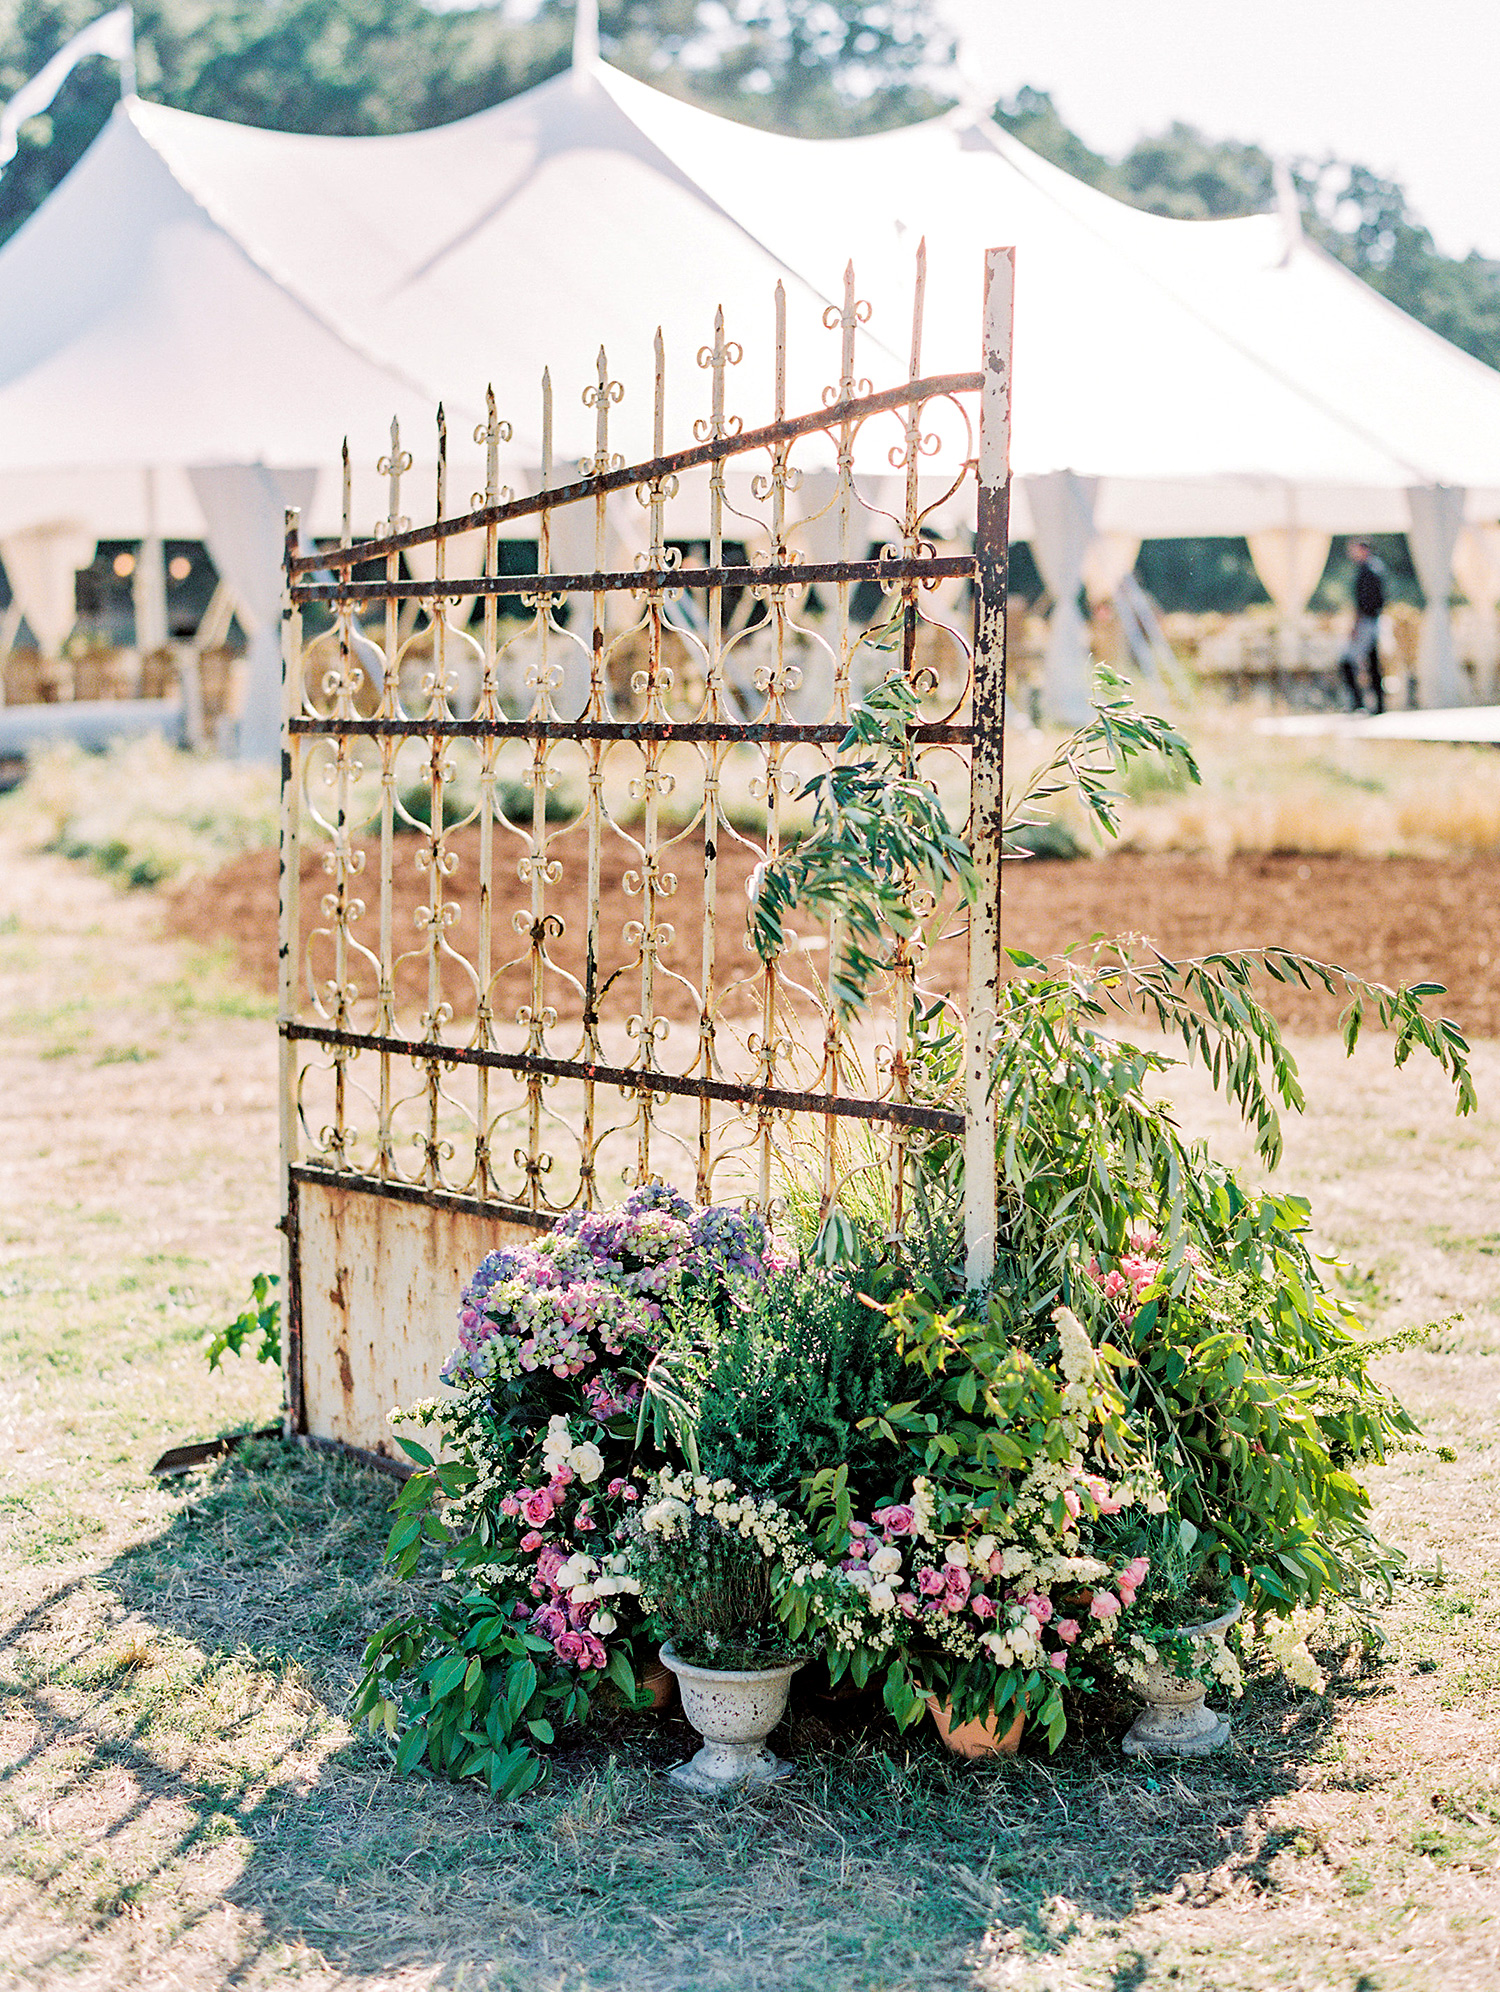 caitlin amit wedding gate with floral decor